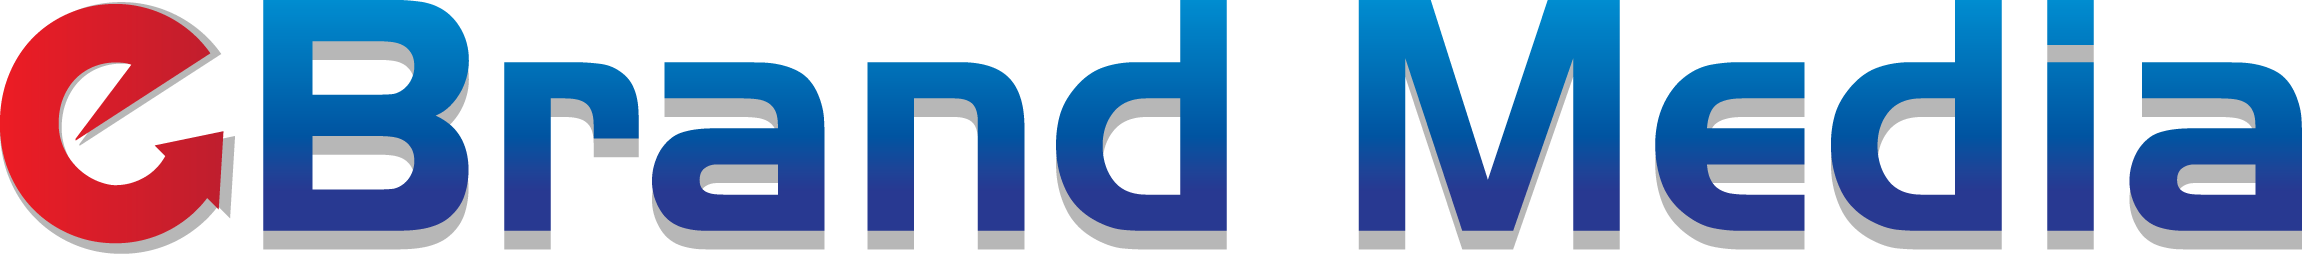 eBrand Media